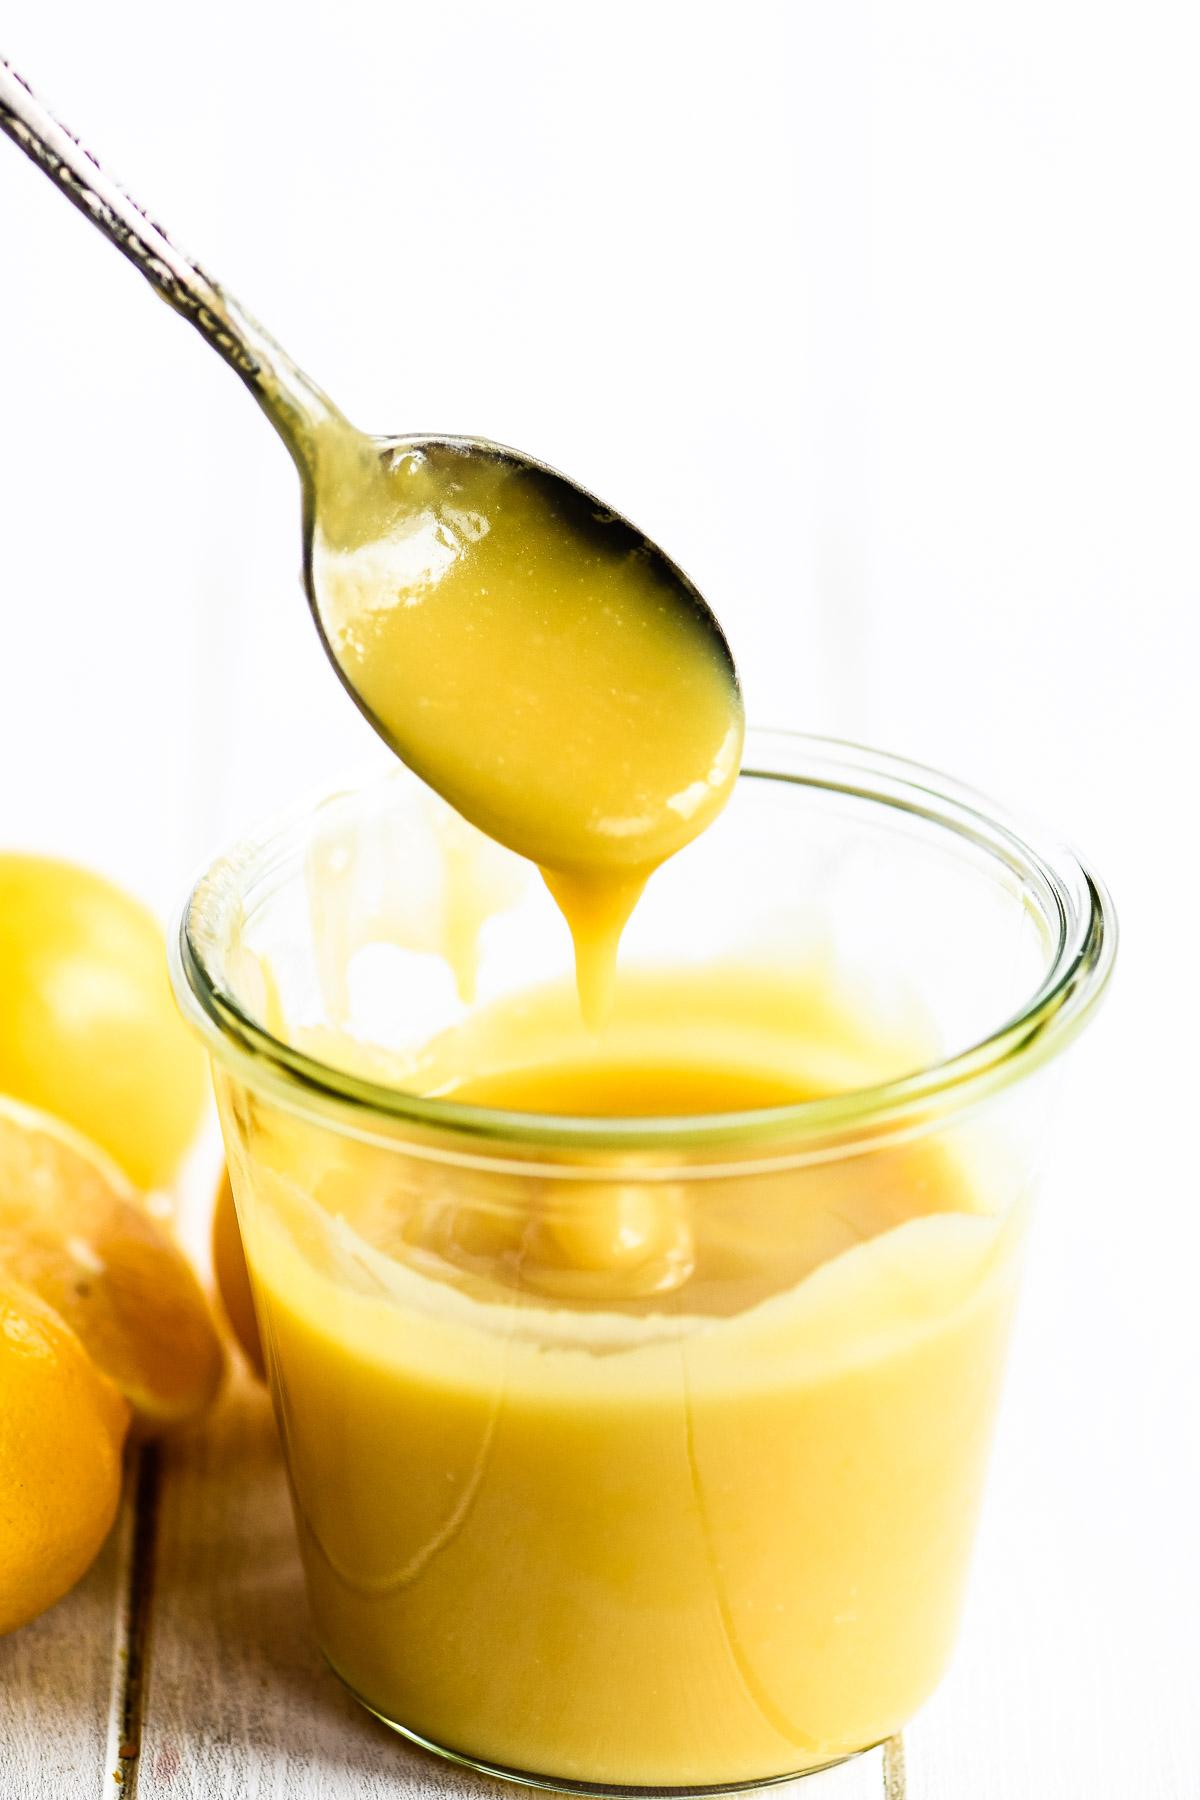 taking a spoonful of Meyer lemon curd